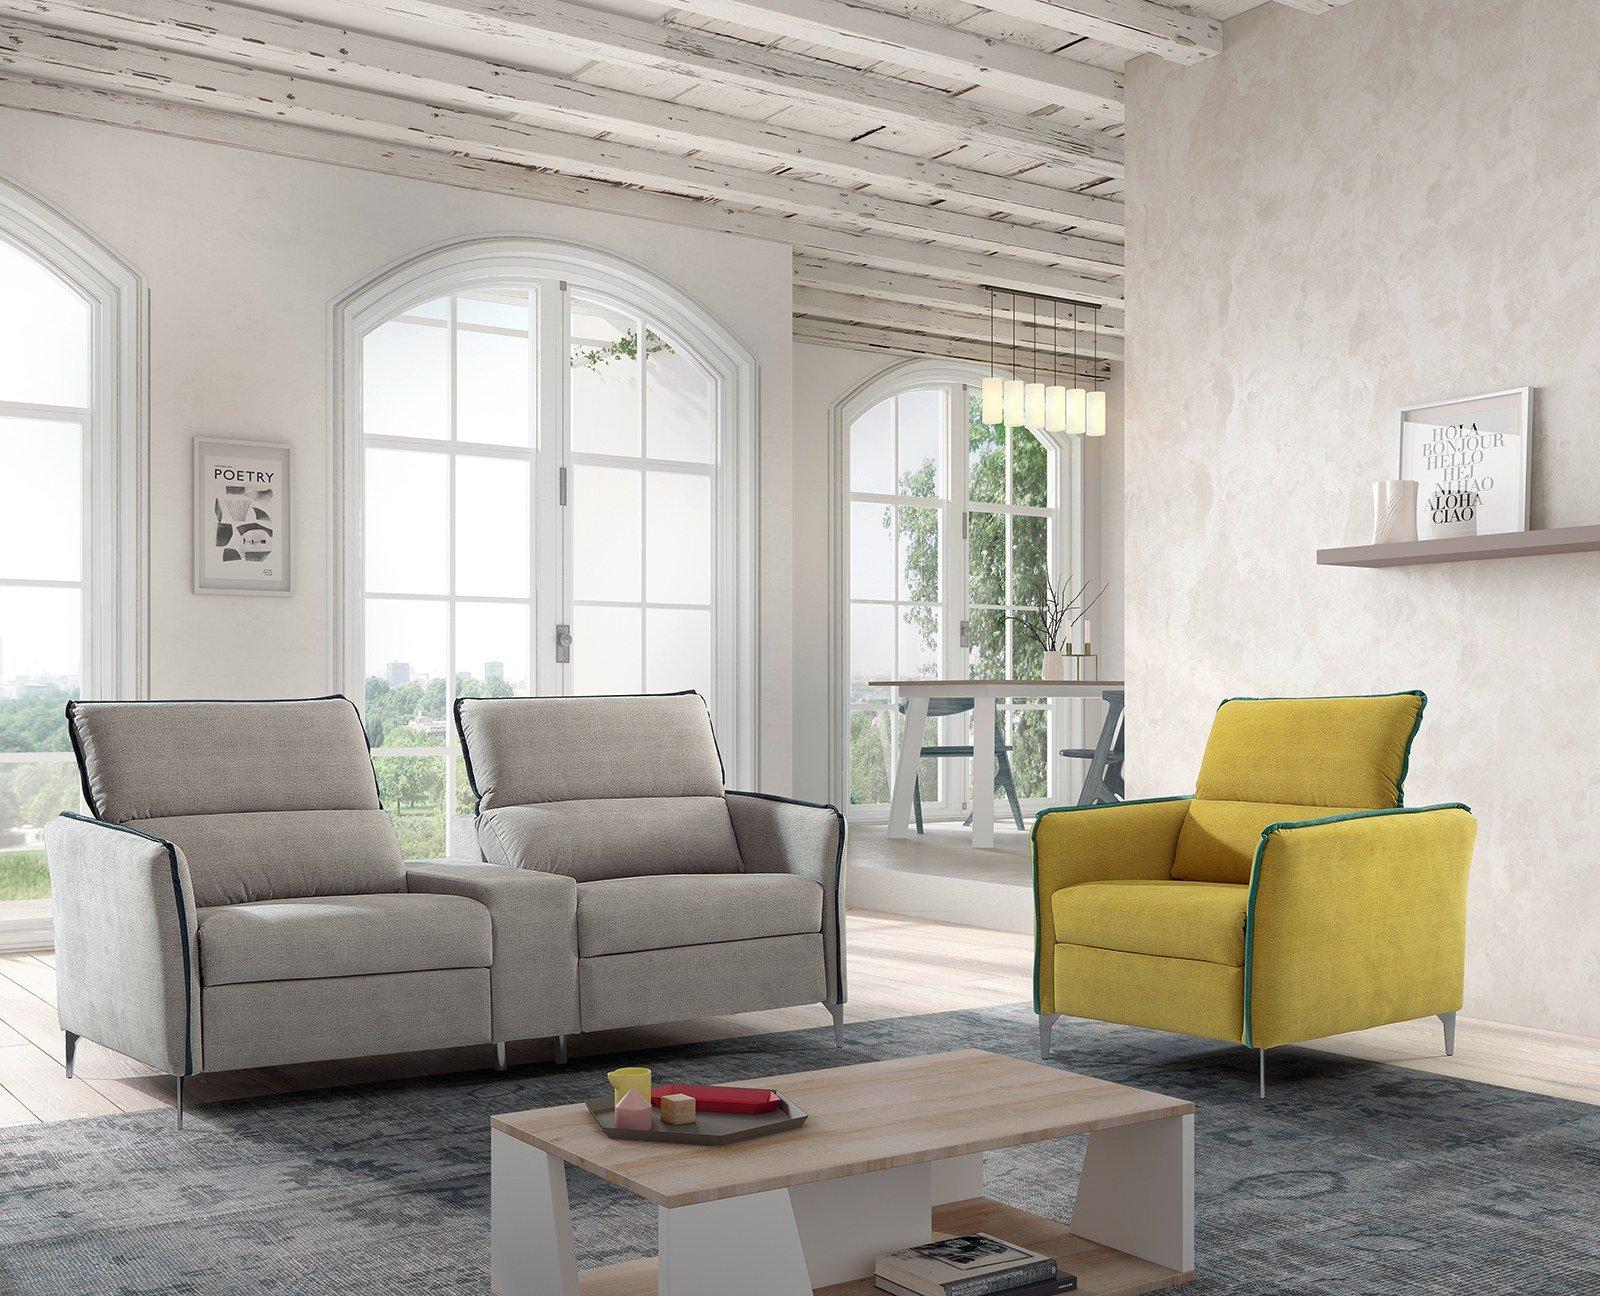 Tasso Fabricants Reunis Meubles Decorations Barbentane 13570